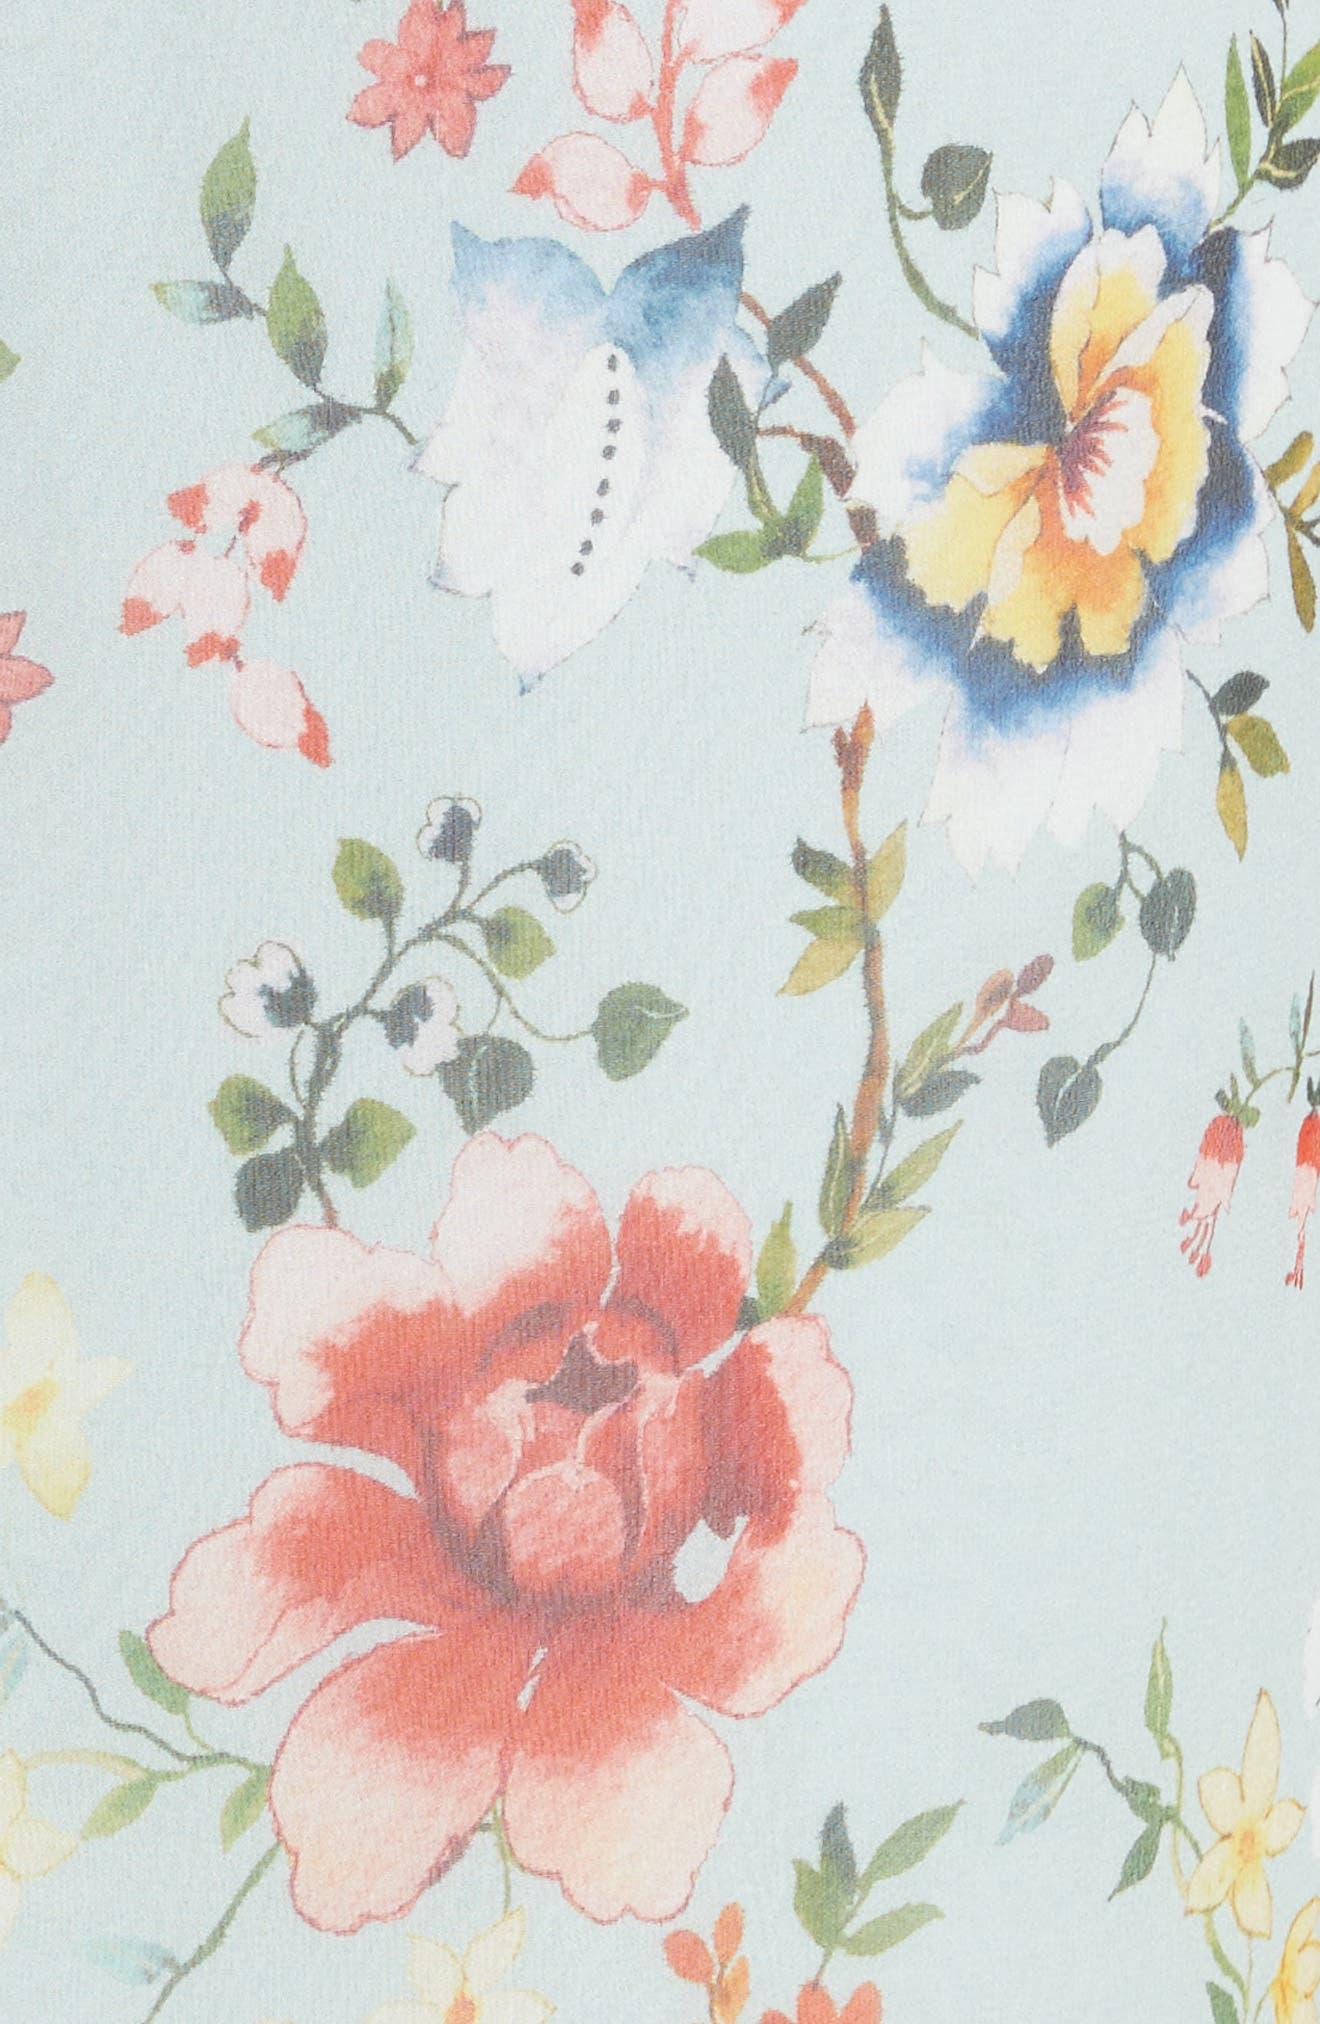 Mable Floral Silk Midi Dress,                             Alternate thumbnail 5, color,                             Floral Soiree-Dusty Aqua